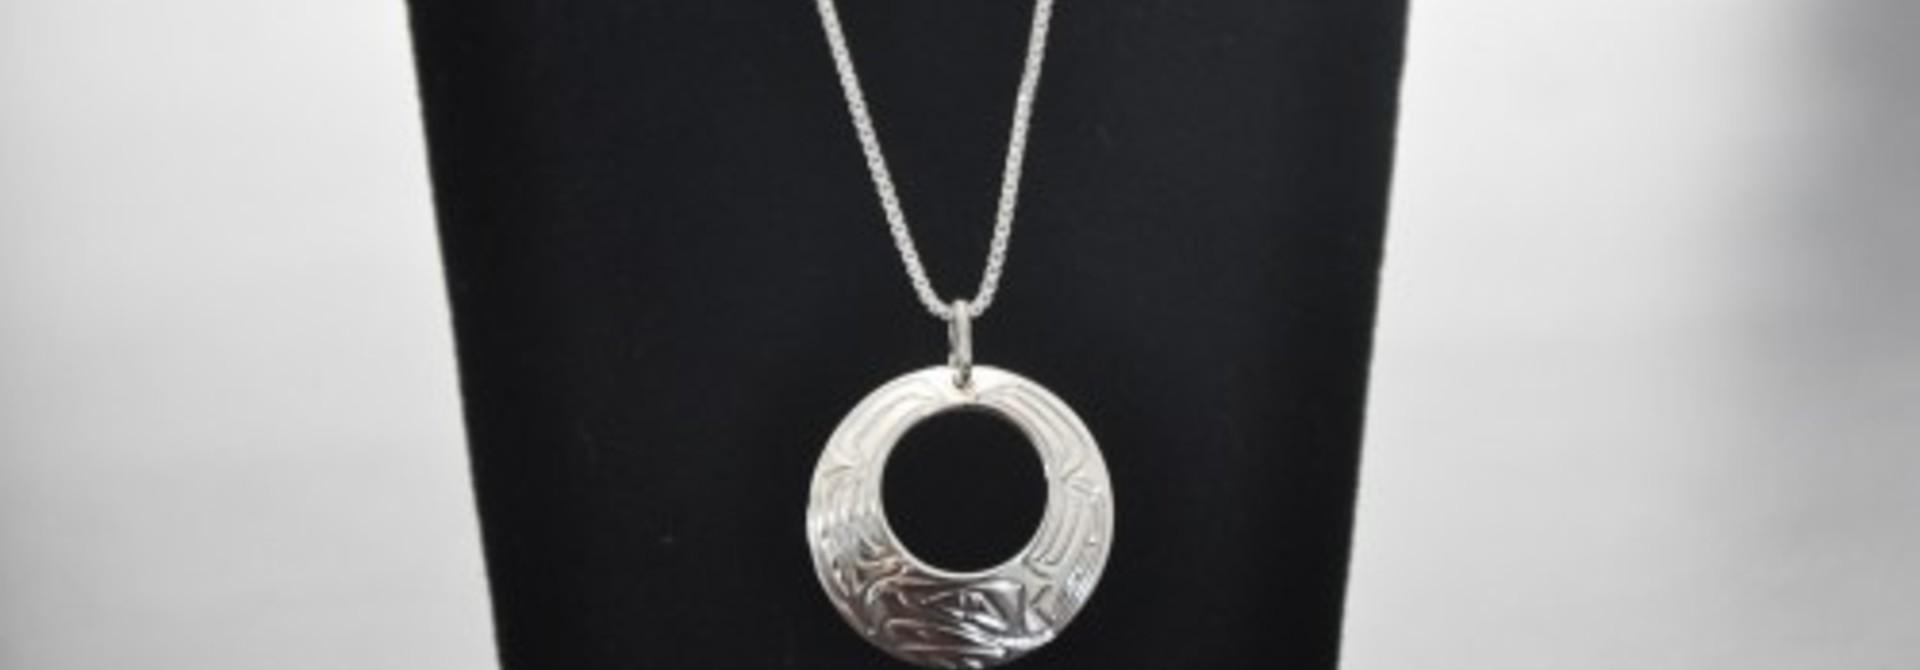 Silver Carved Eagle Pendant - 23N